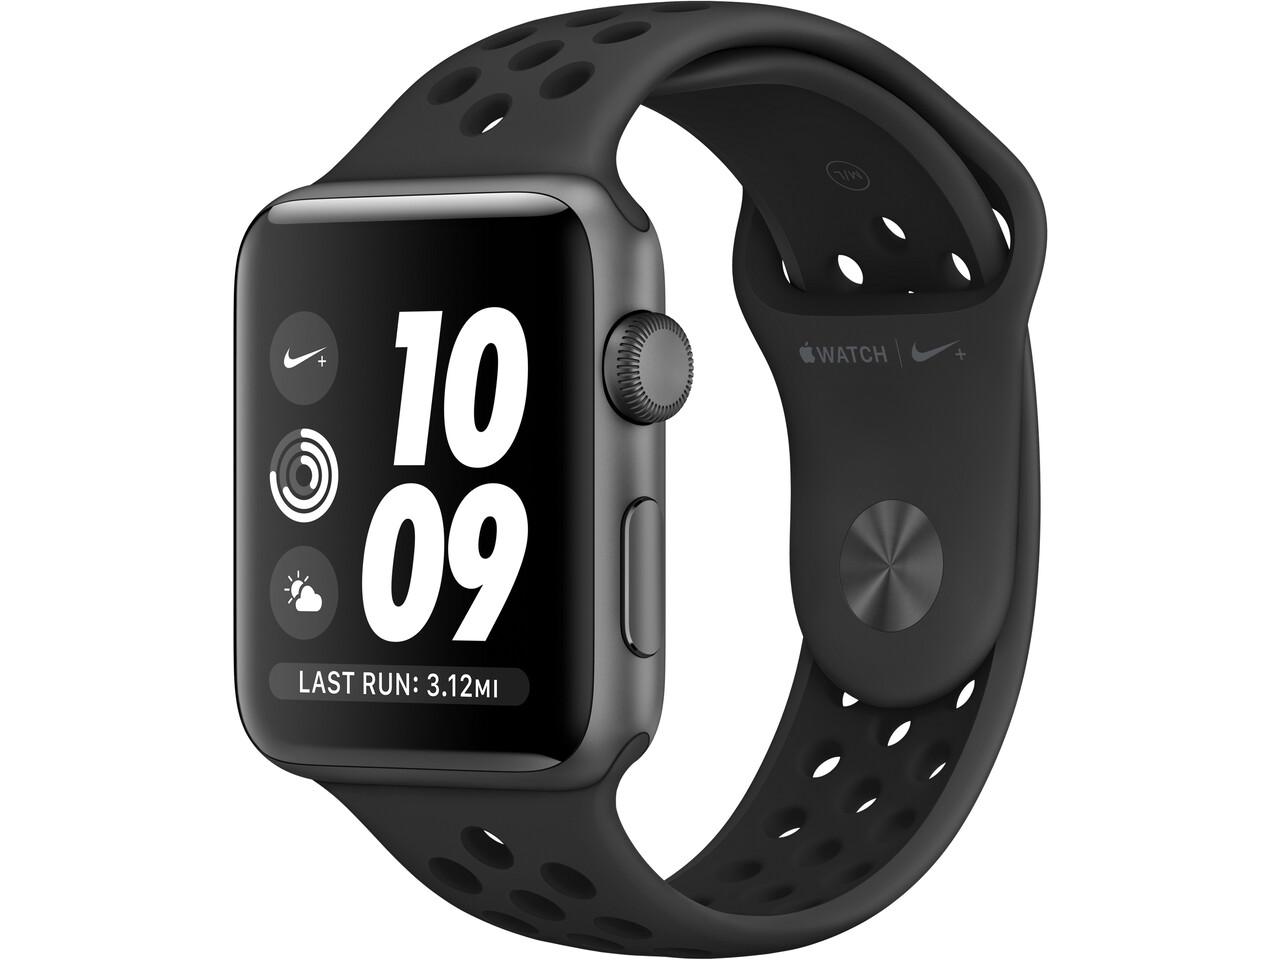 apple watch nike series 3 38mm space gray aluminum black nike sport band